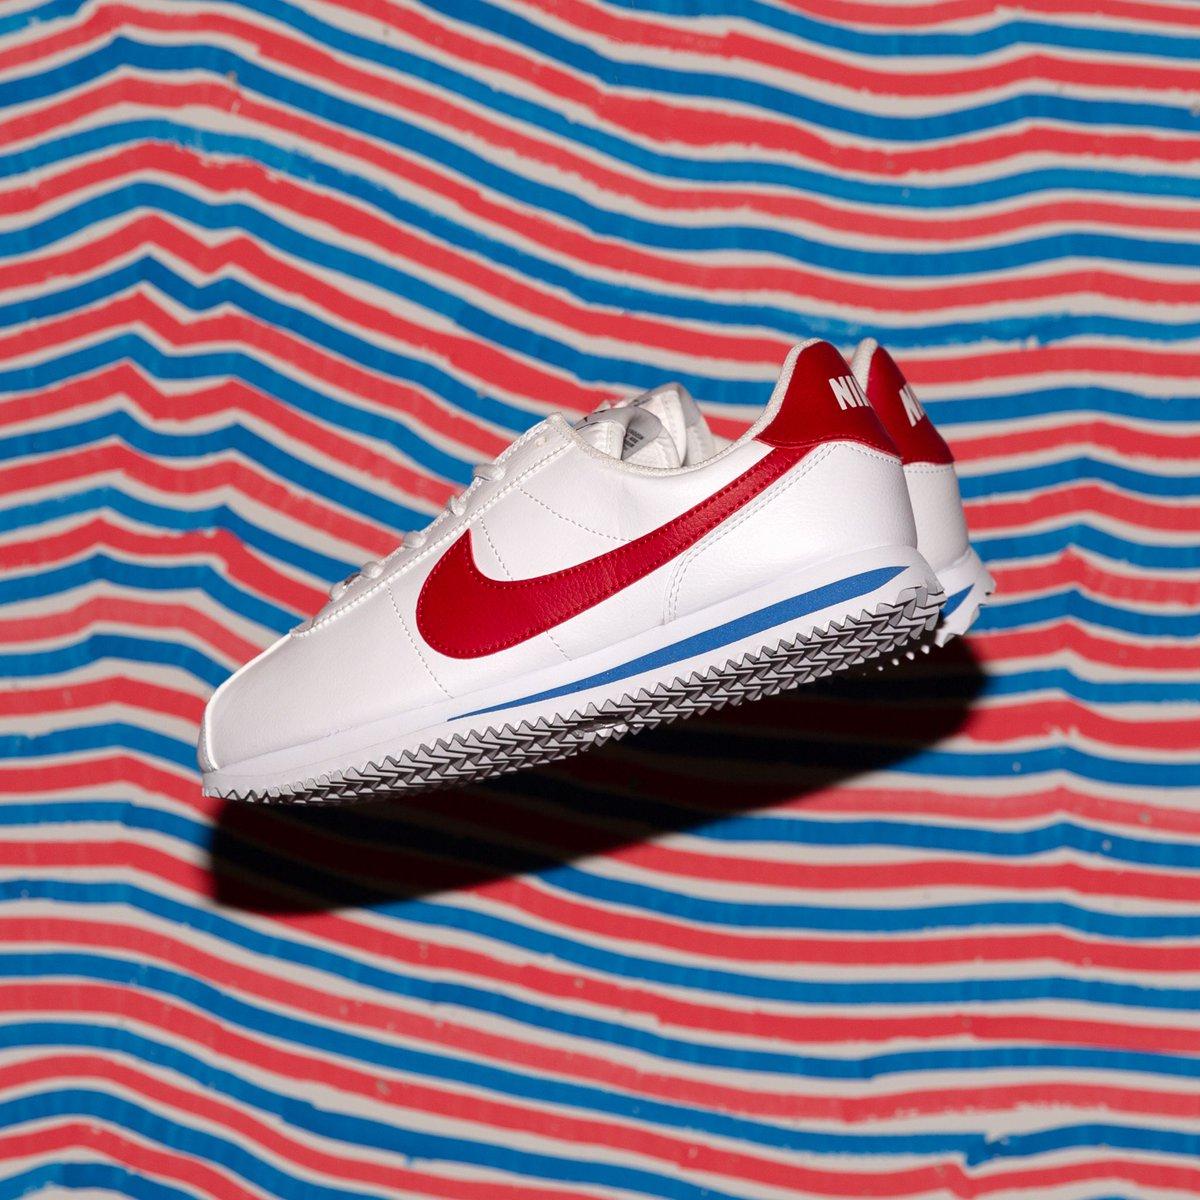 NEW IN ! Nike Cortez Basic Sl (Gs) - White Varsity Red-Varsity Royal-Black  SHOP HERE   http   bit.ly 2LyVvtS pic.twitter.com 29EcblpAtK 5750289eb